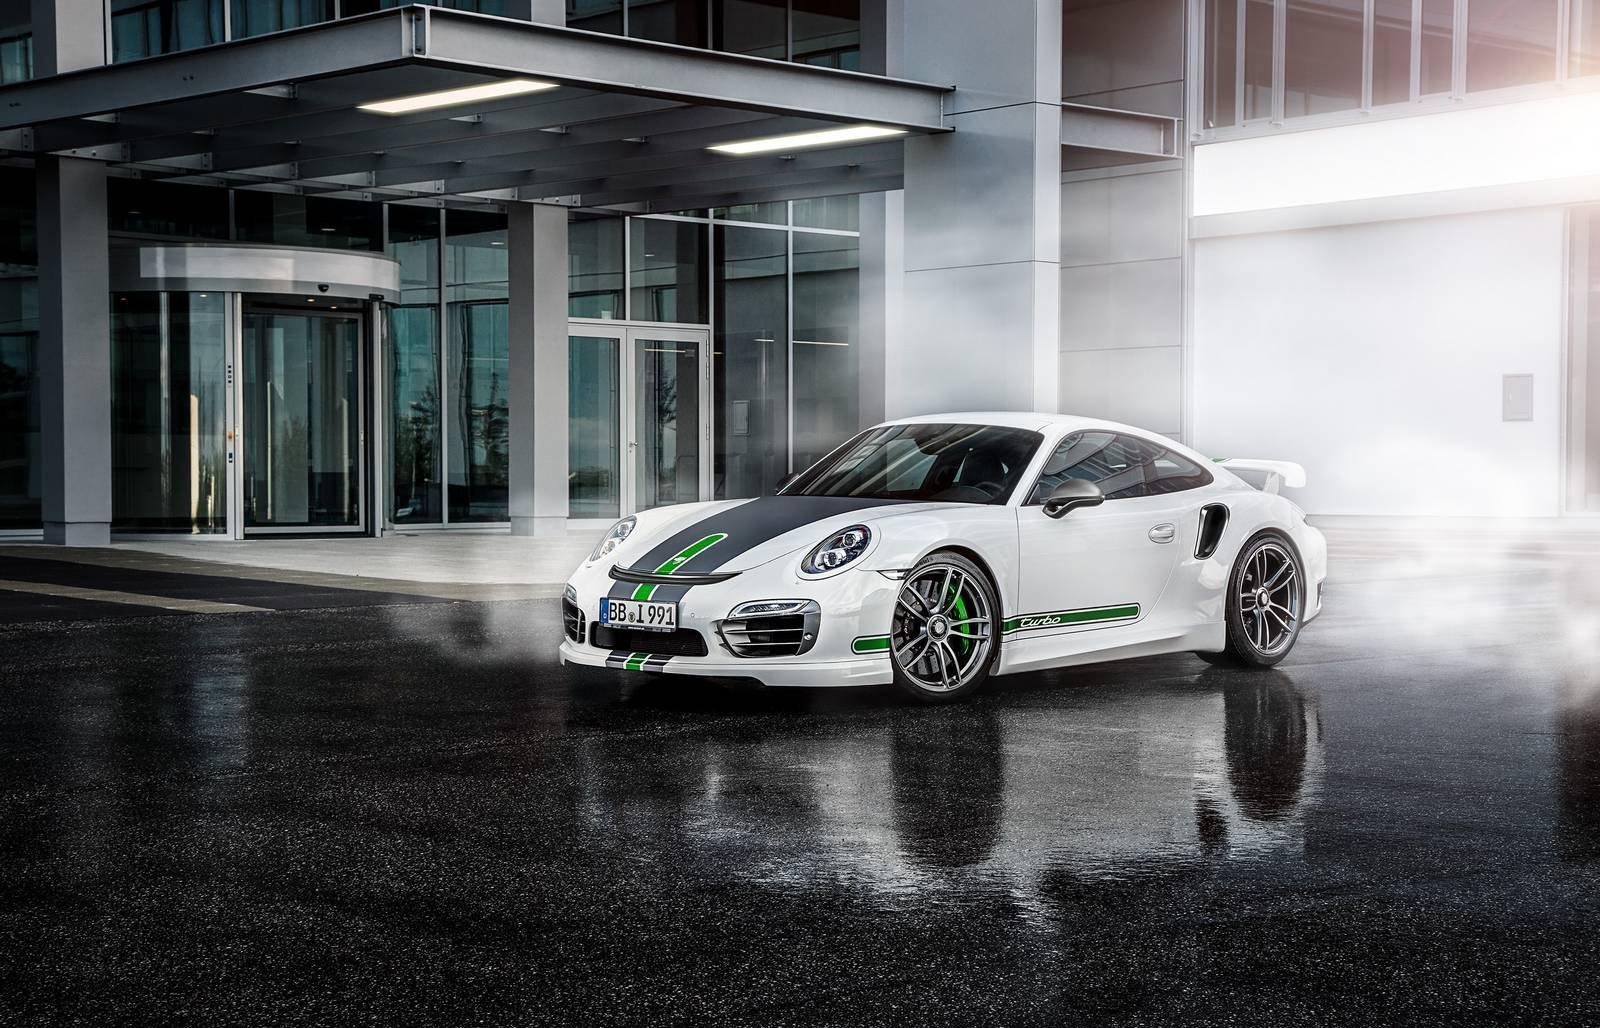 Porsche 911 Turbo 2014 - TechArt